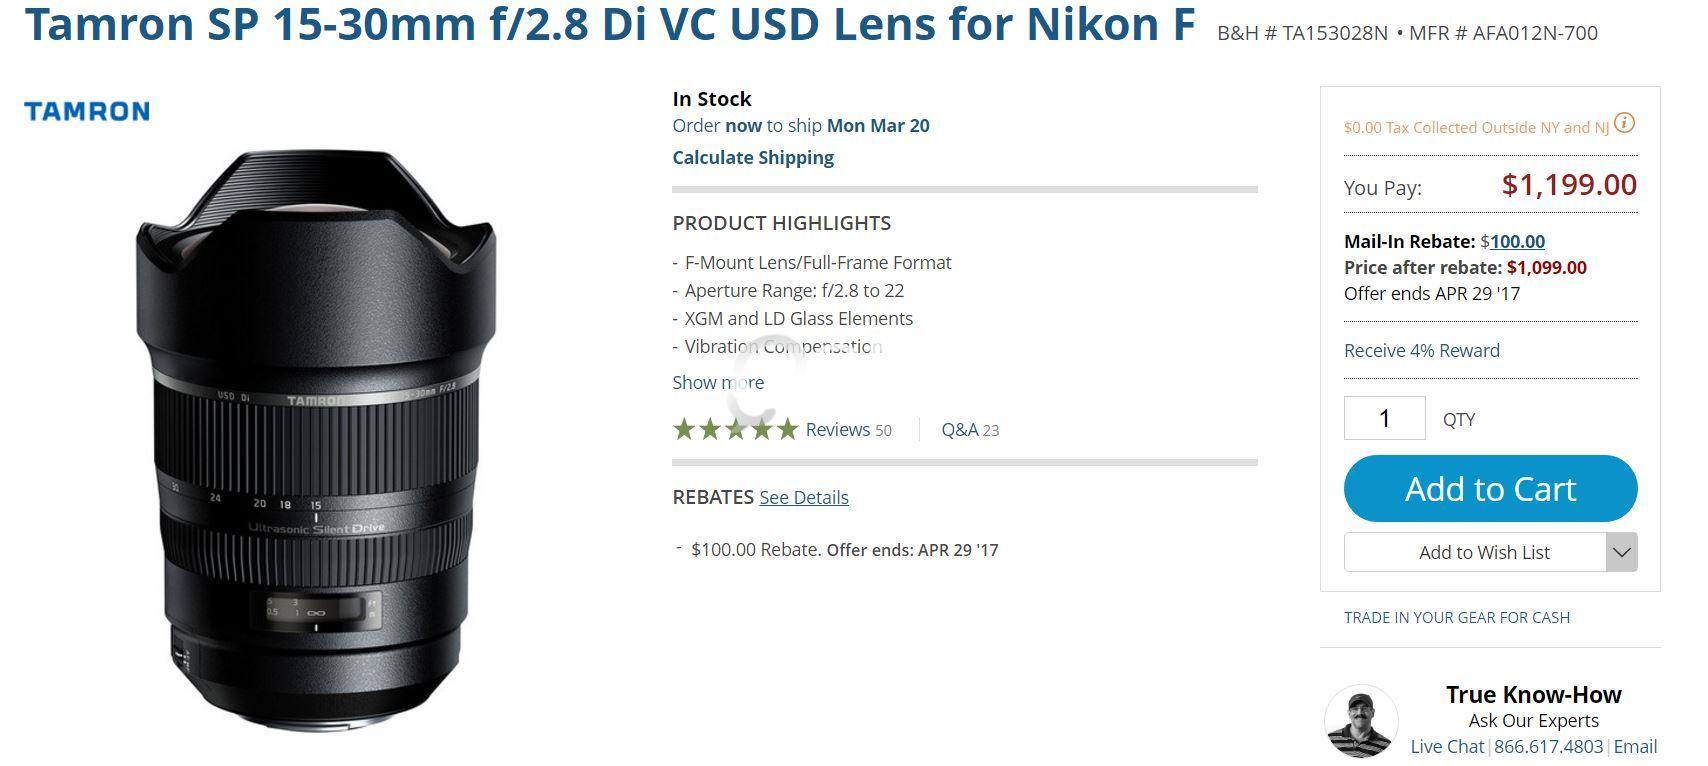 Tamron SP 15-30mm f/2.8 Di VC USD Lens for Nikon F | Qatar Living